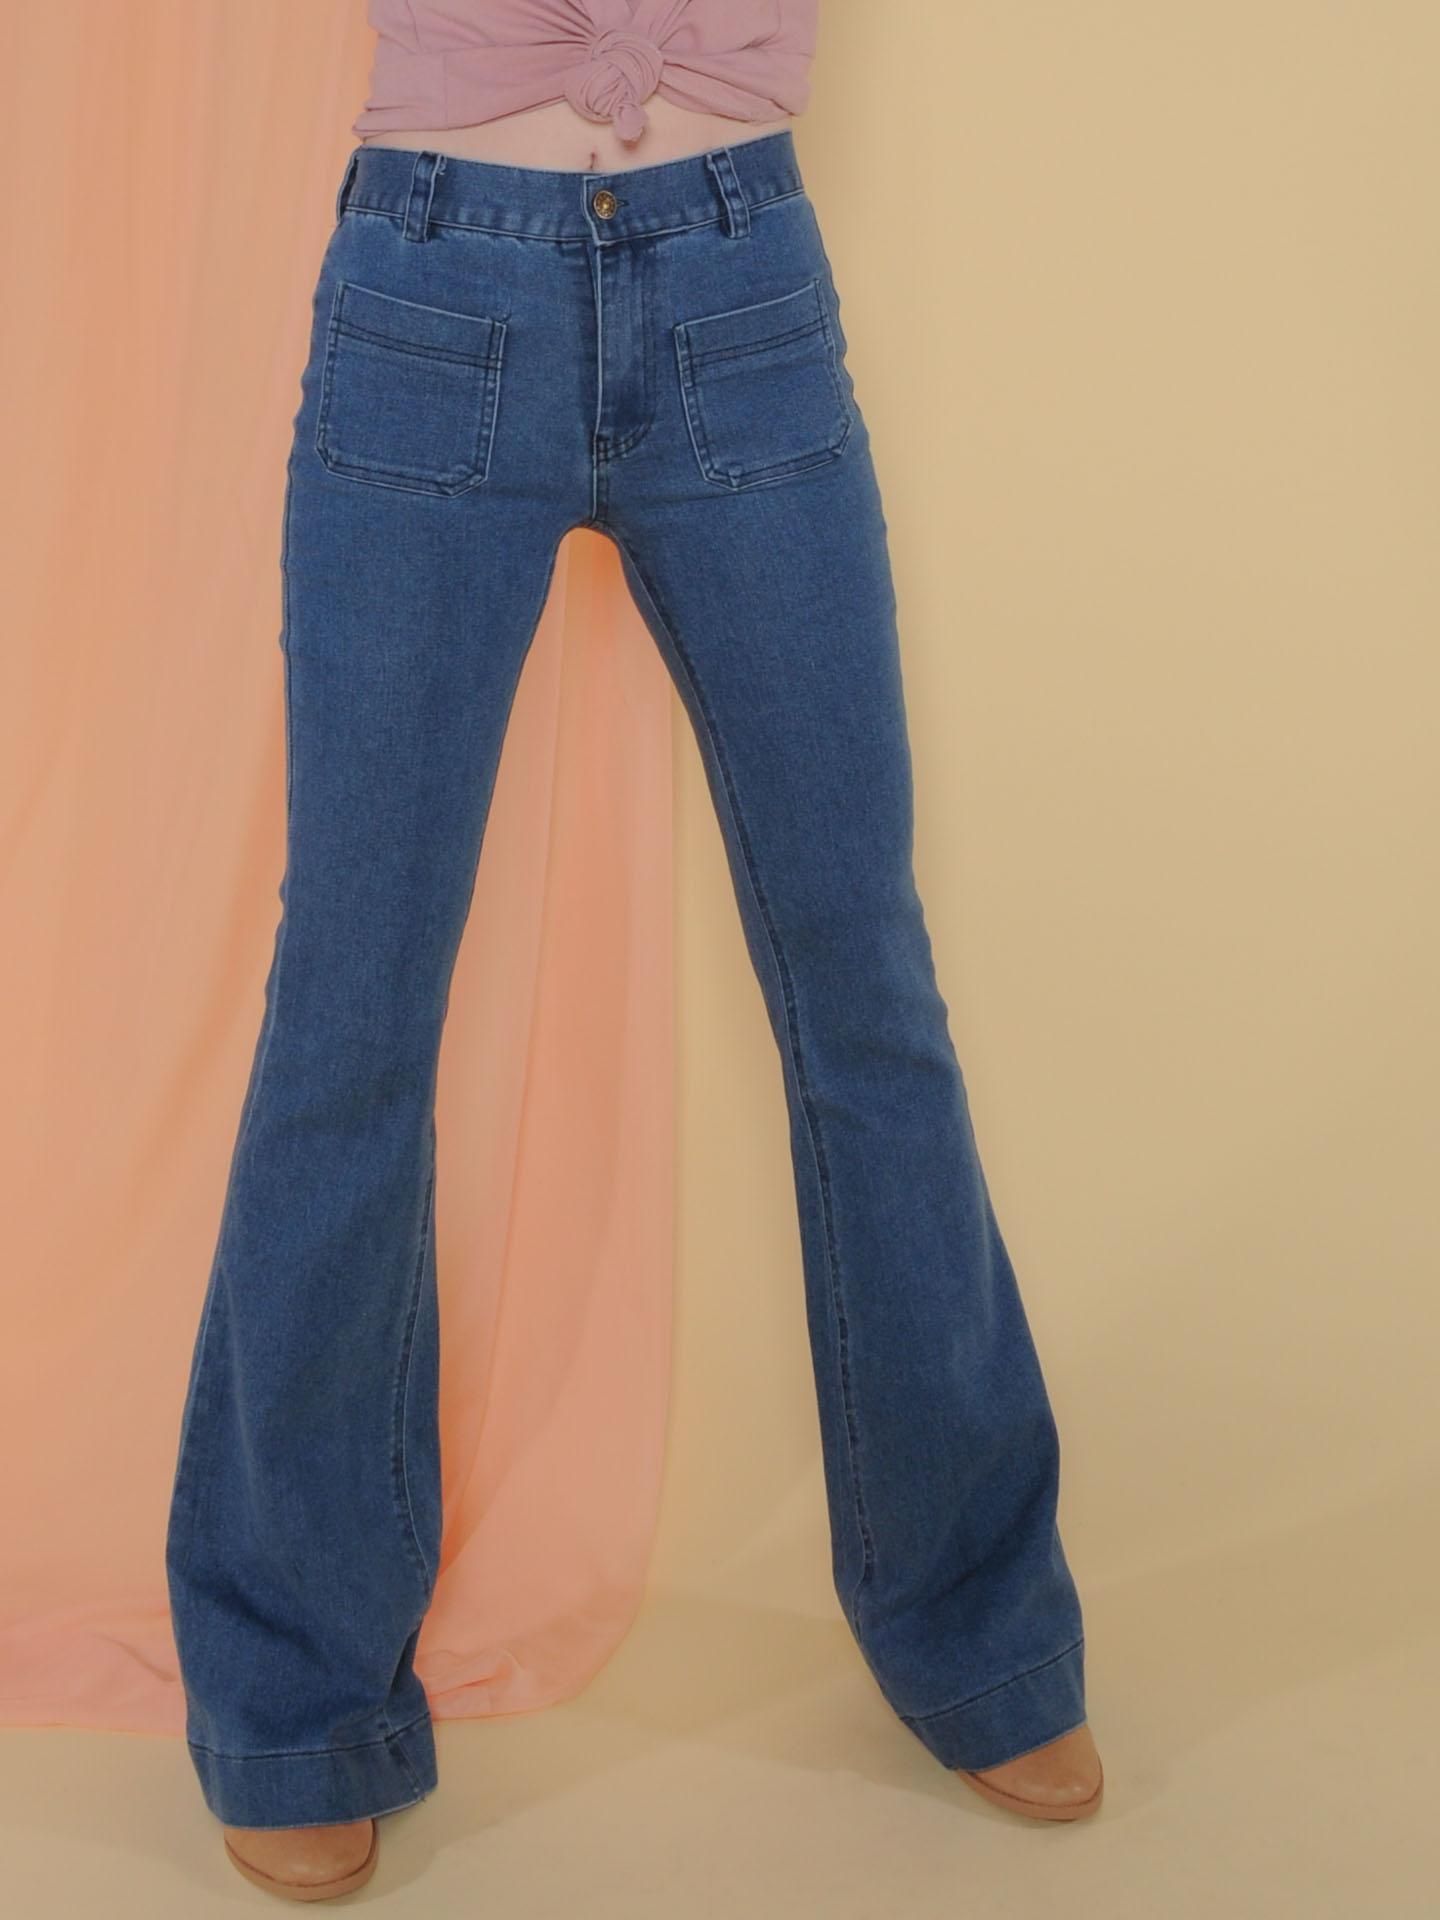 Elijah Denim  Blue 90's Style Bell Bottoms Front